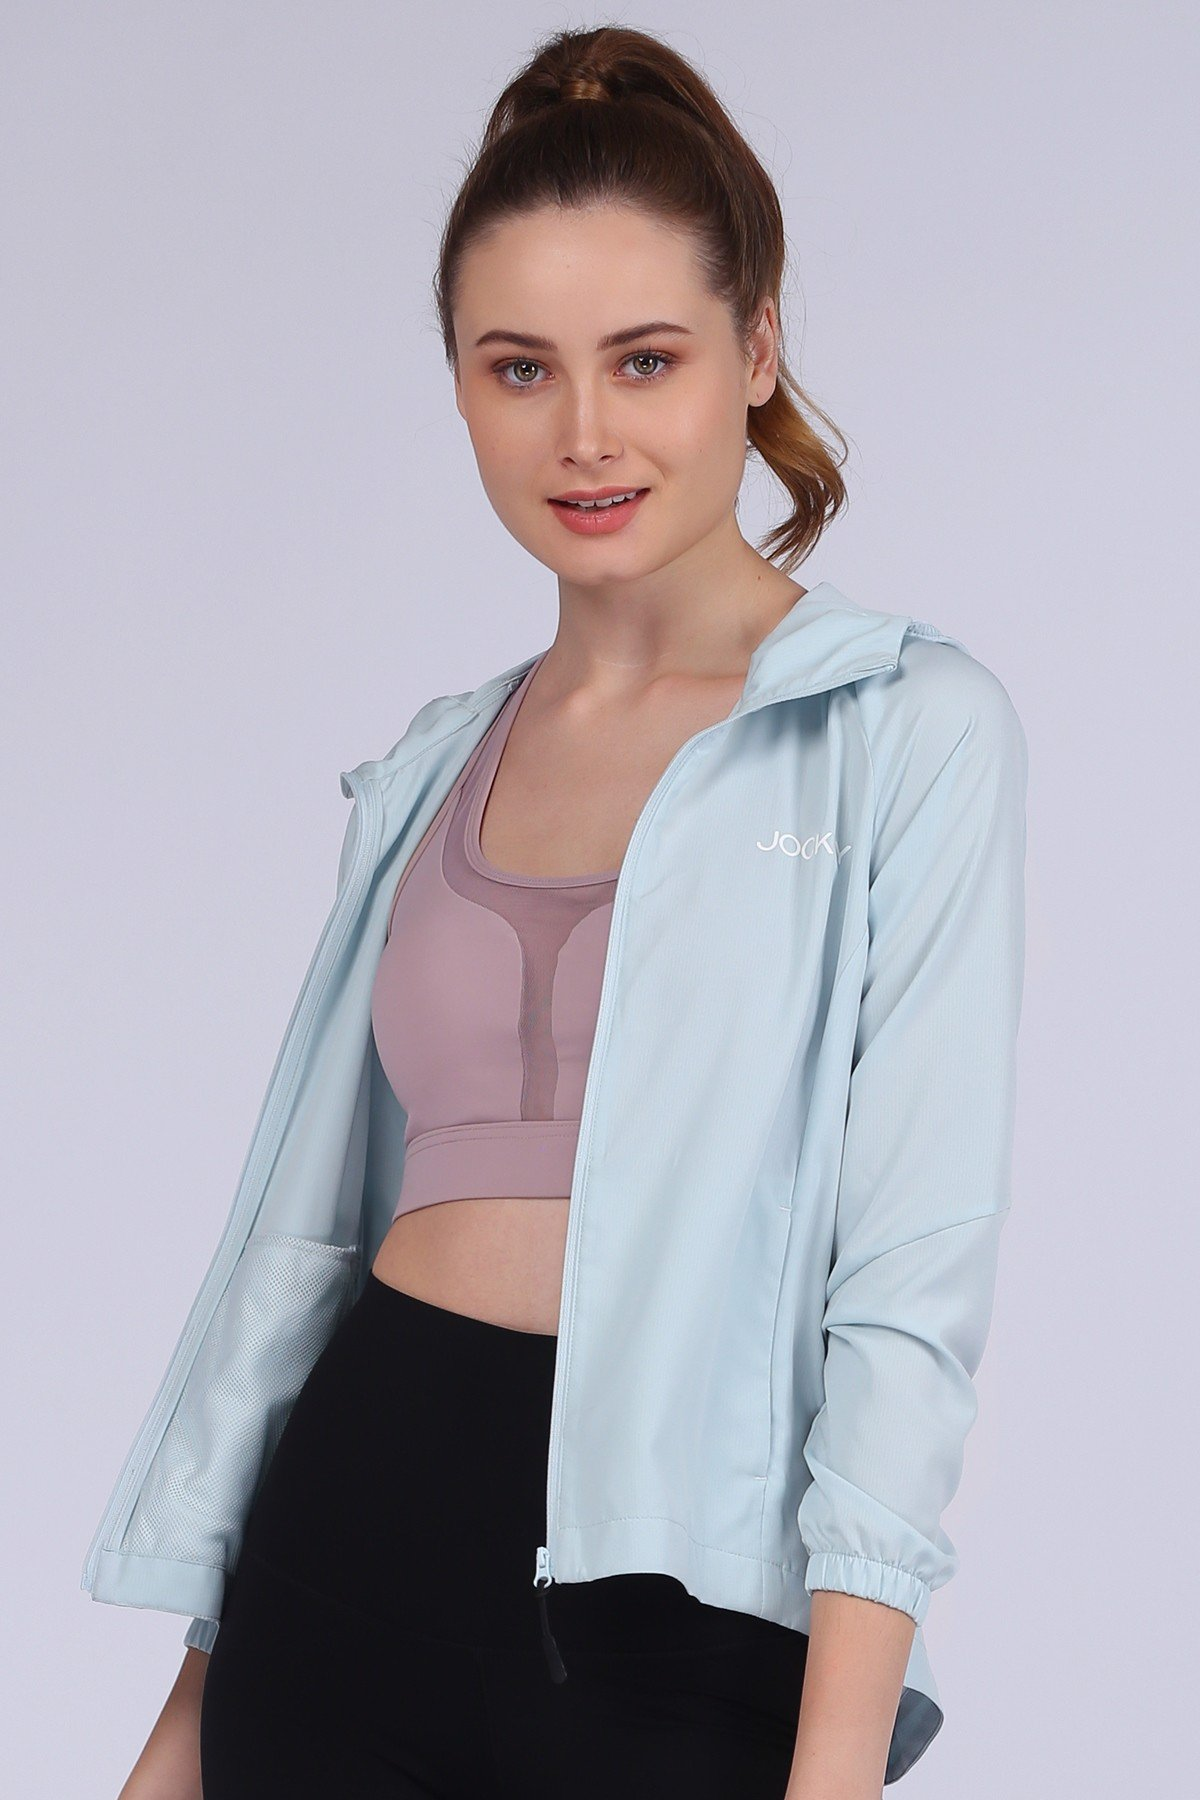 Áo khoác Jockey chống tia UV nữ - 0332